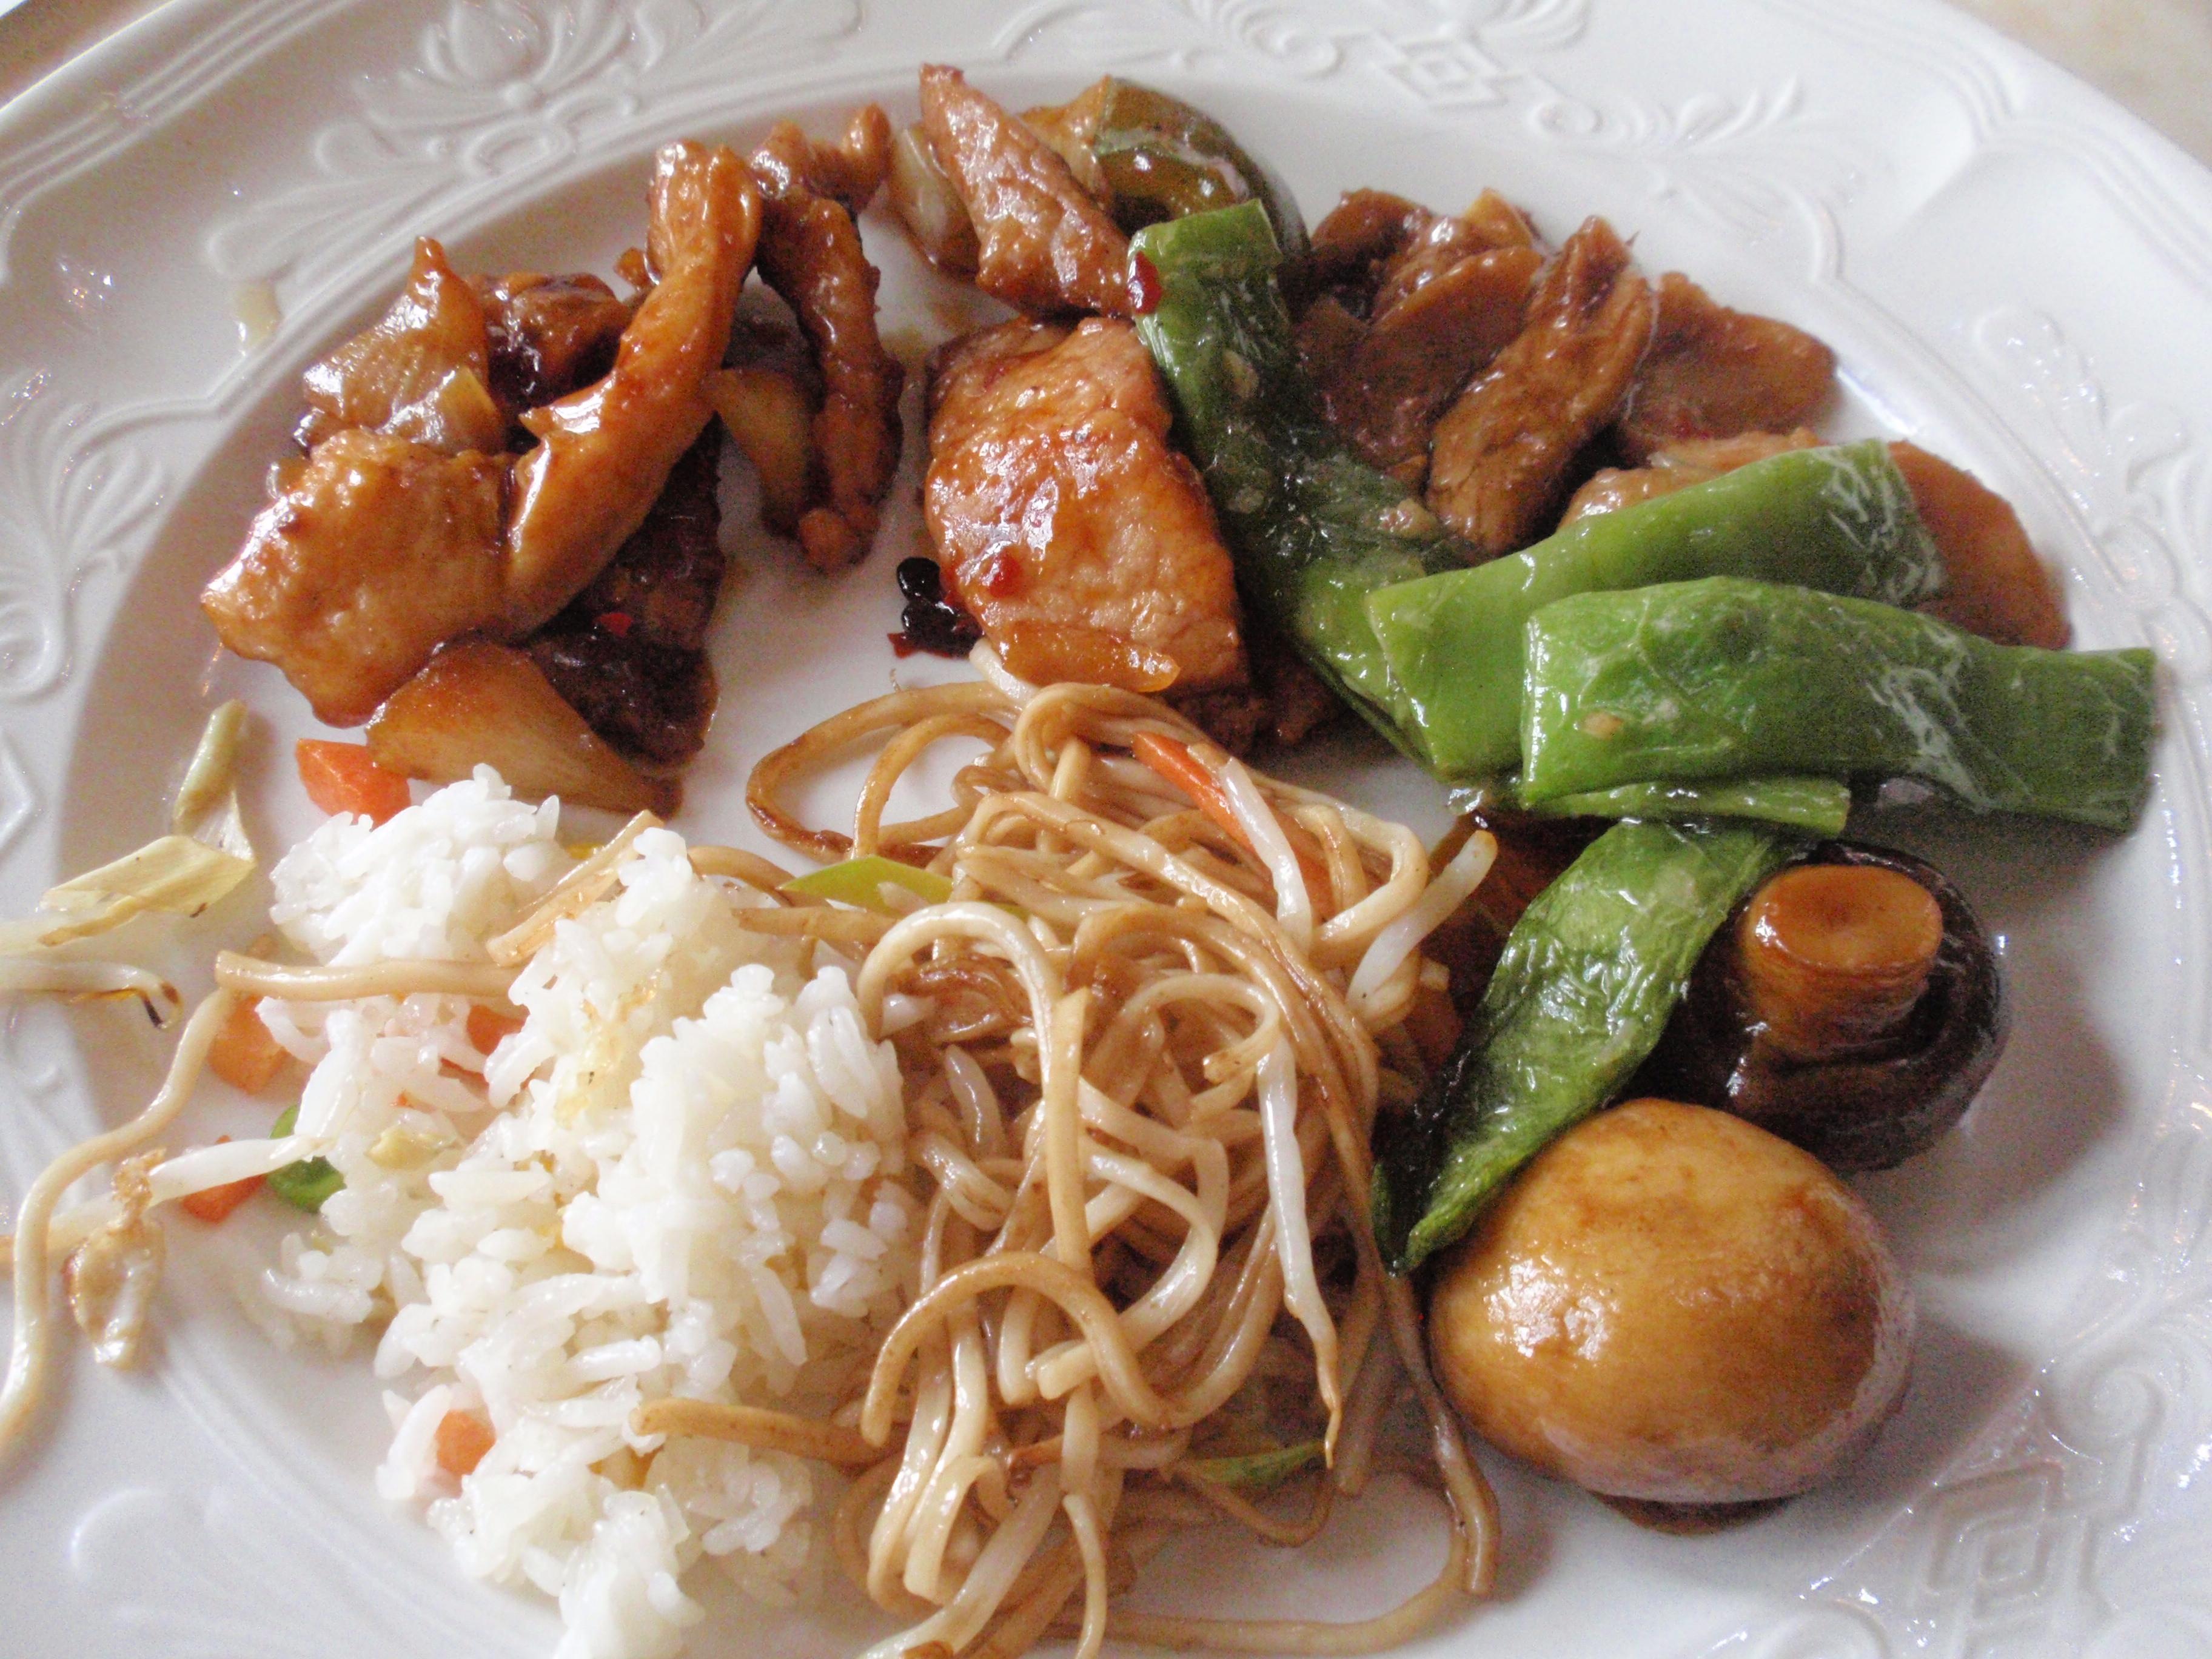 GastroGuide Kamp-Lintfort - Bewertungen